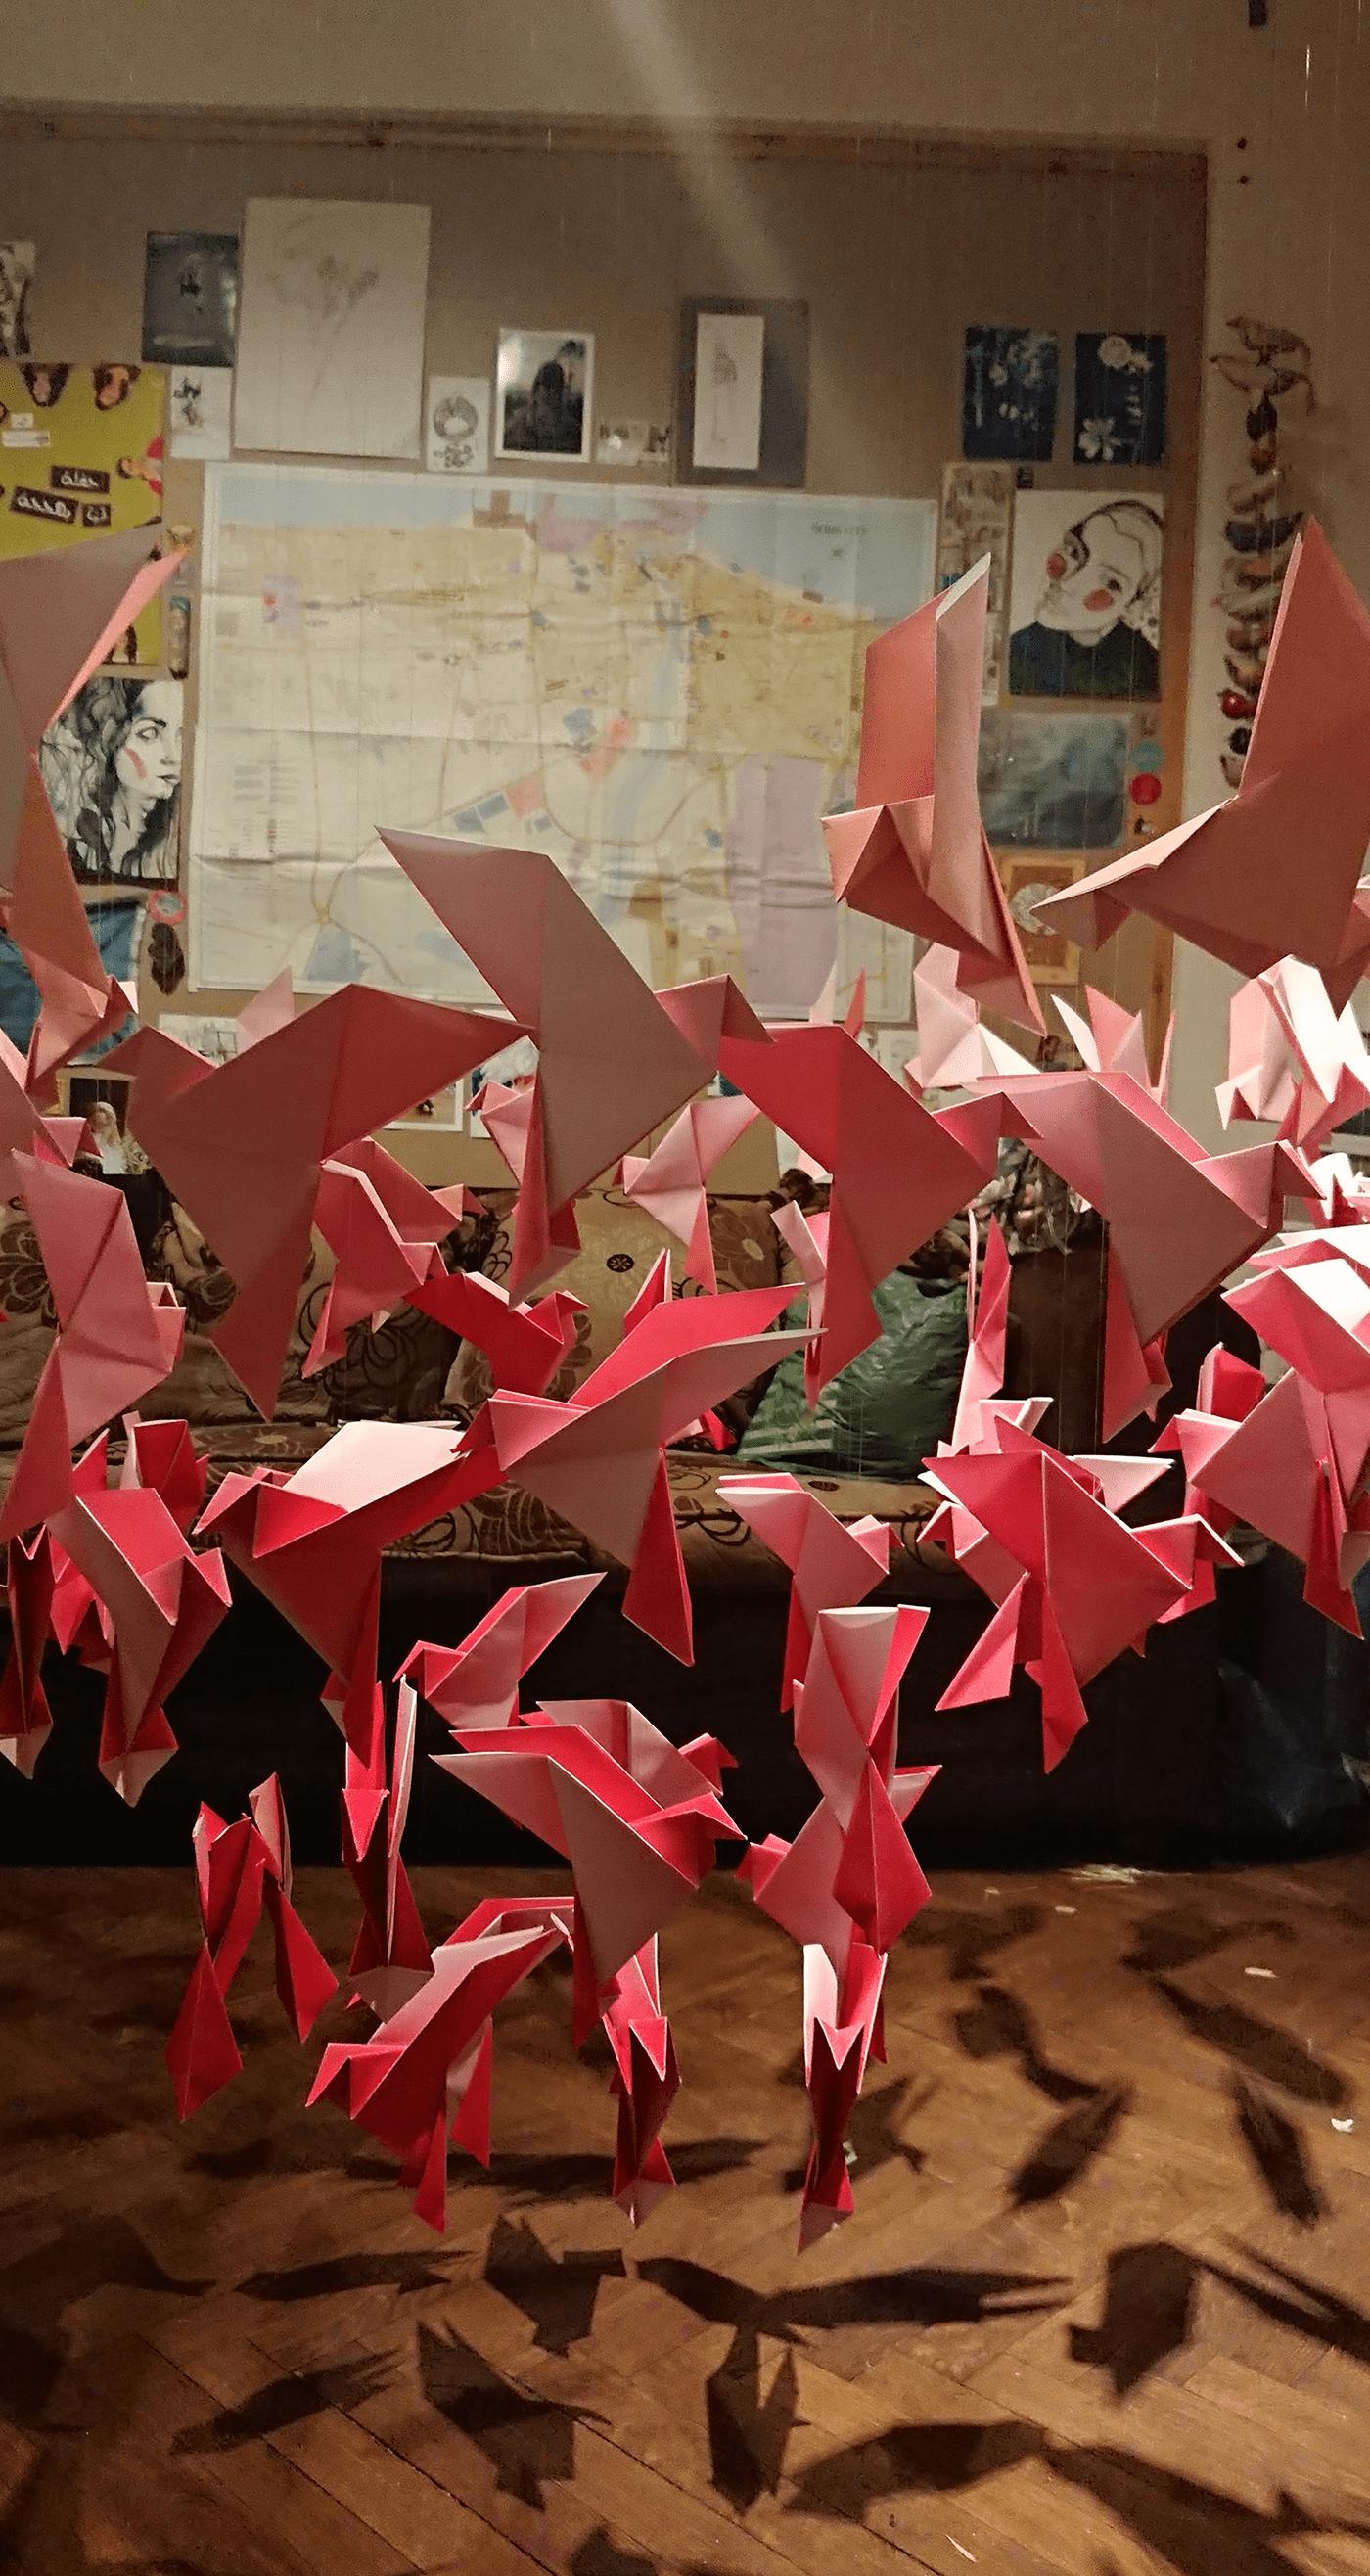 Origami Rehab on Twitter: